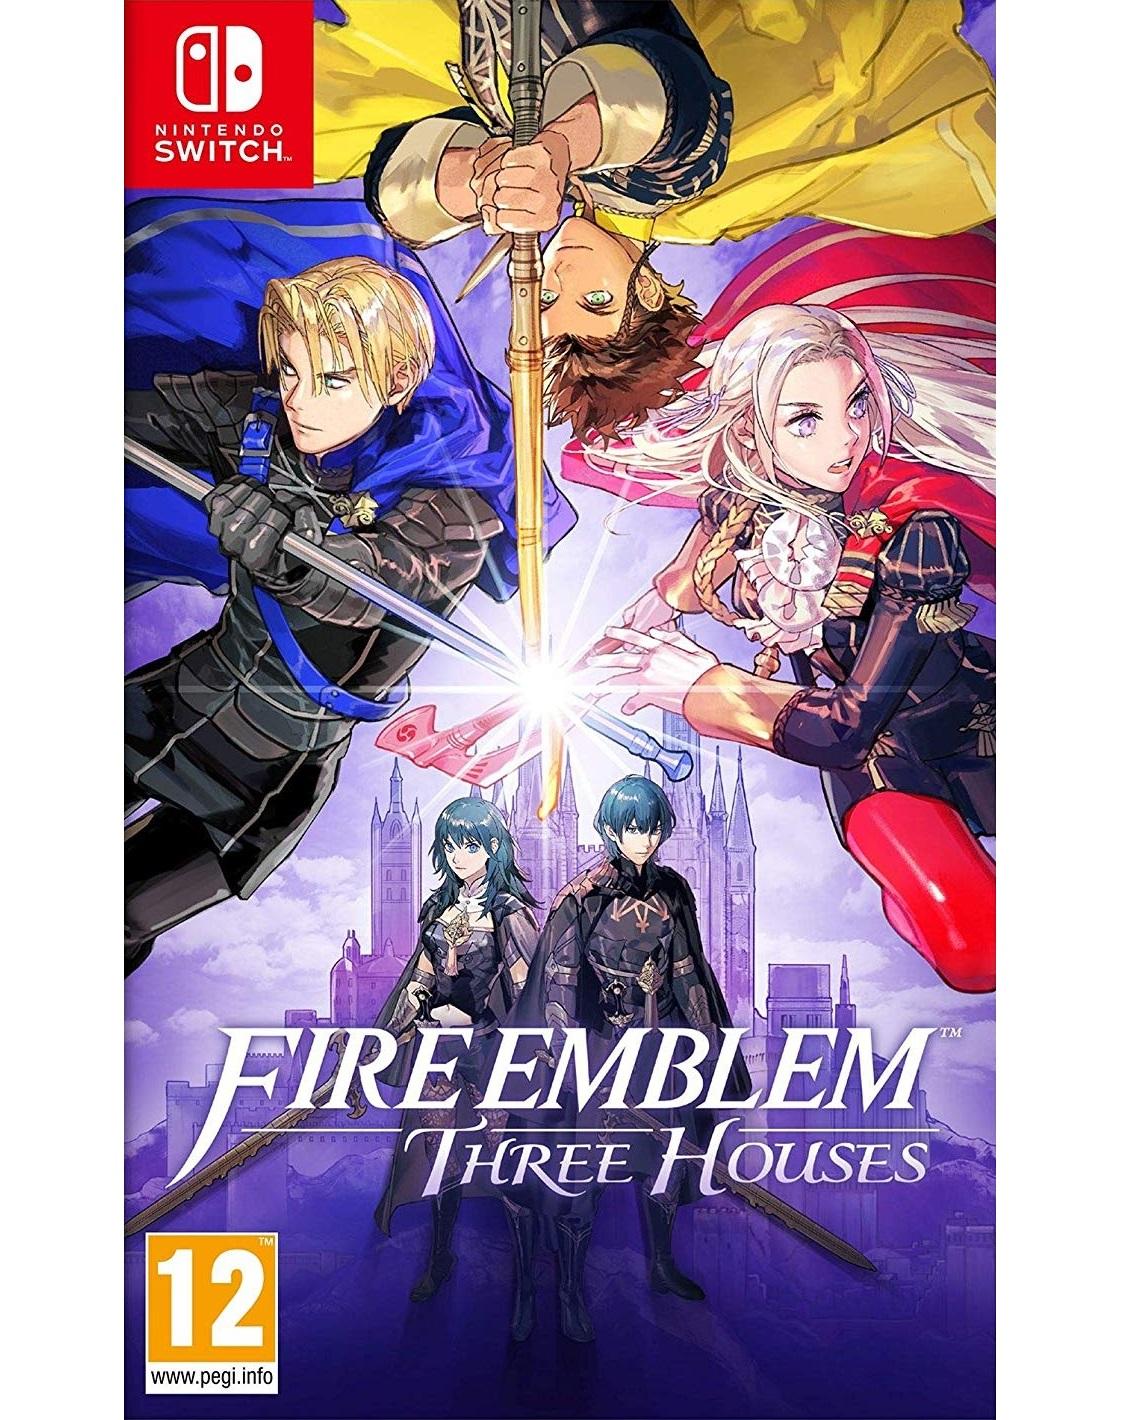 Fire Emblem Three Houses - Switch